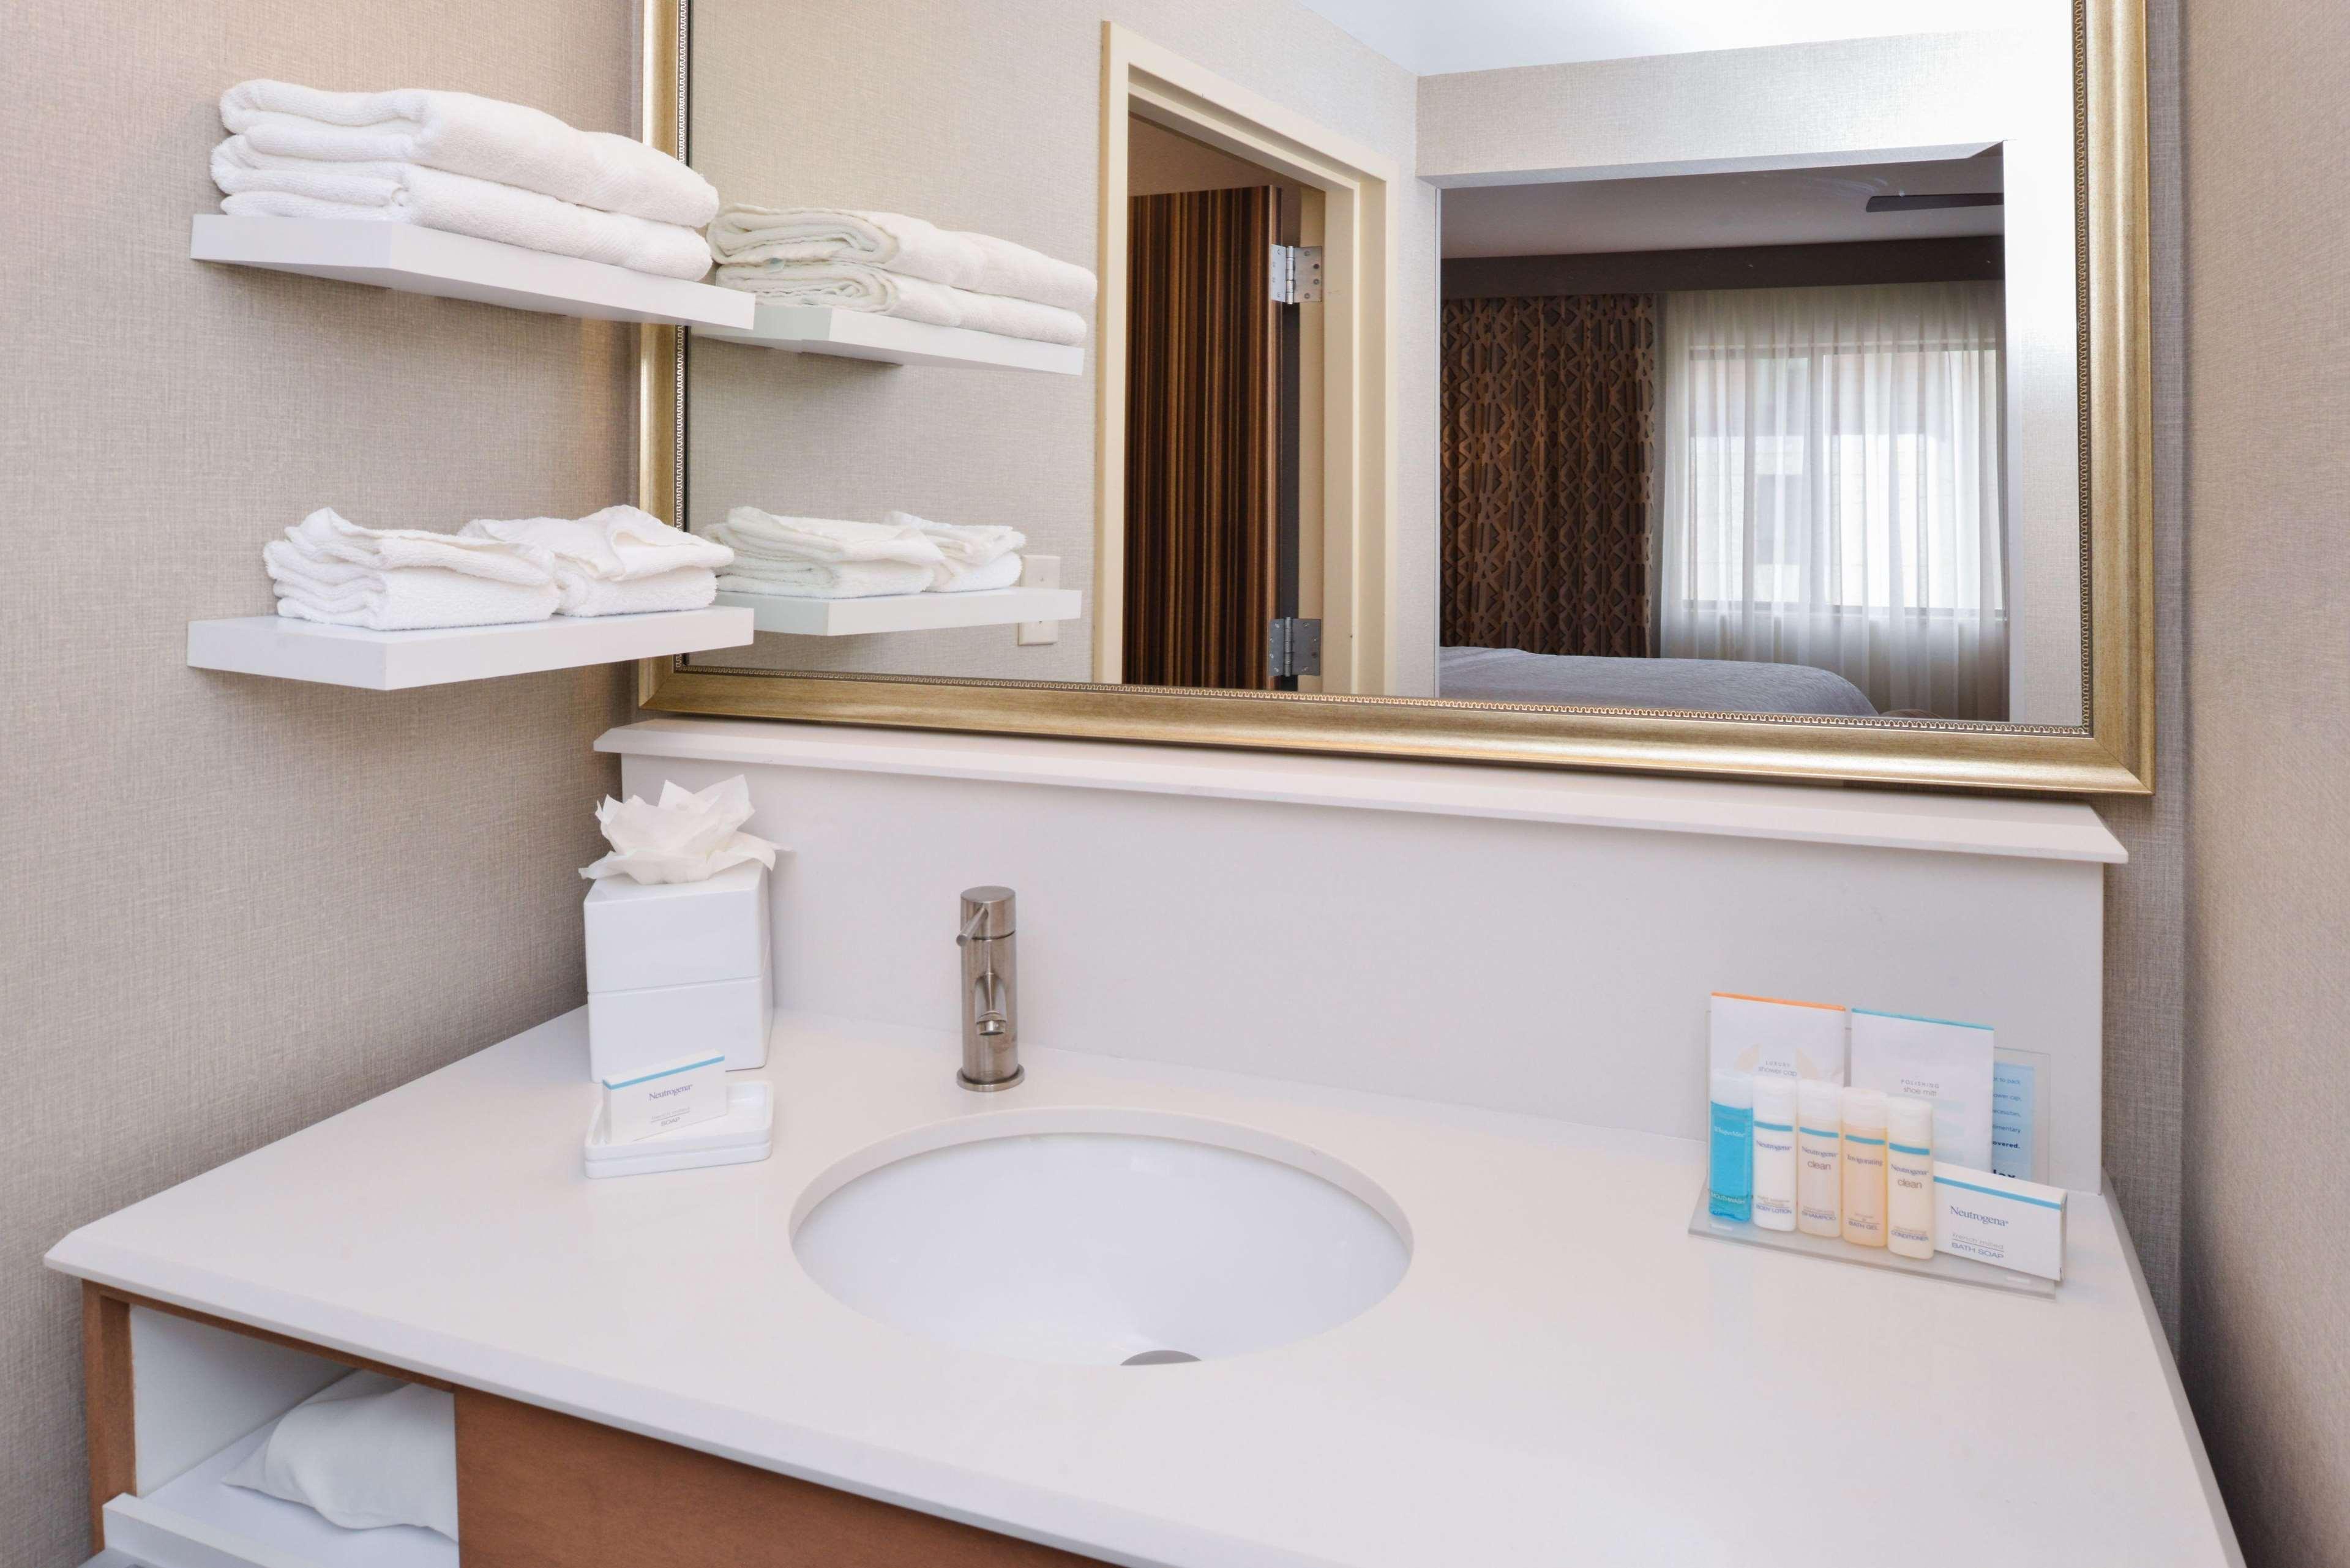 Hampton Inn & Suites Denver-Speer Boulevard image 13